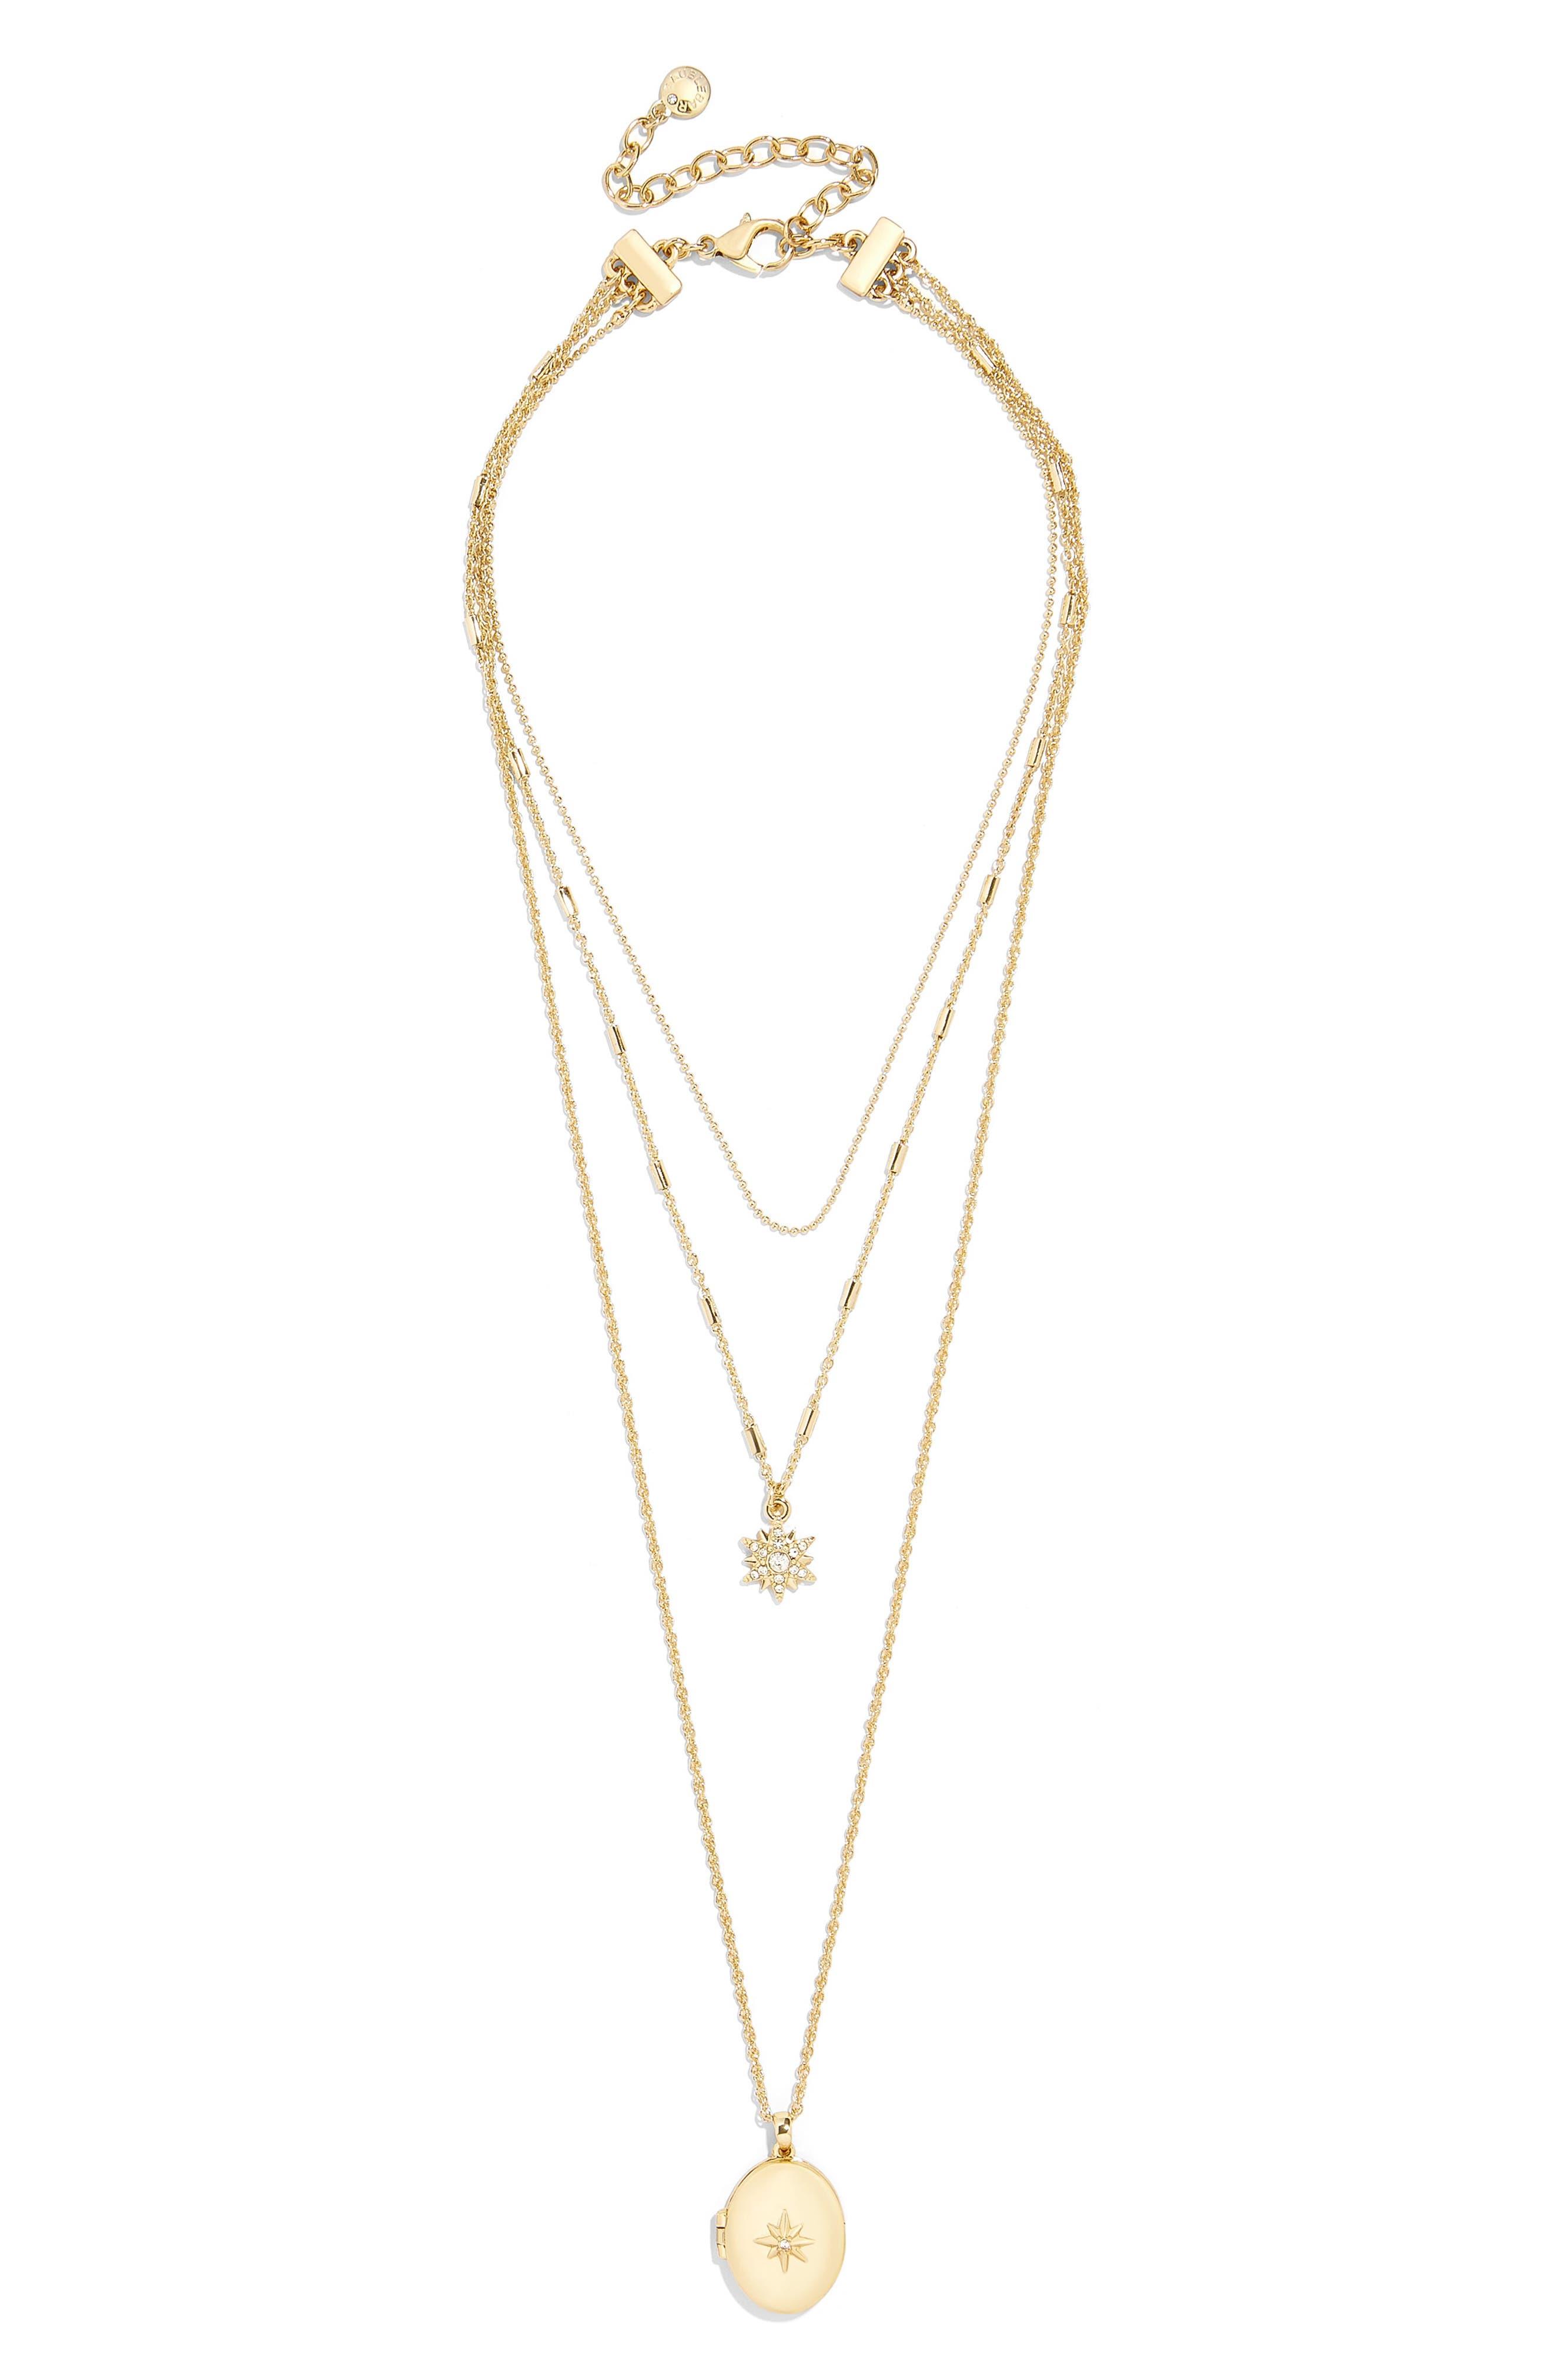 BAUBLEBAR, Melisandra Layered Pendant Necklace, Main thumbnail 1, color, GOLD